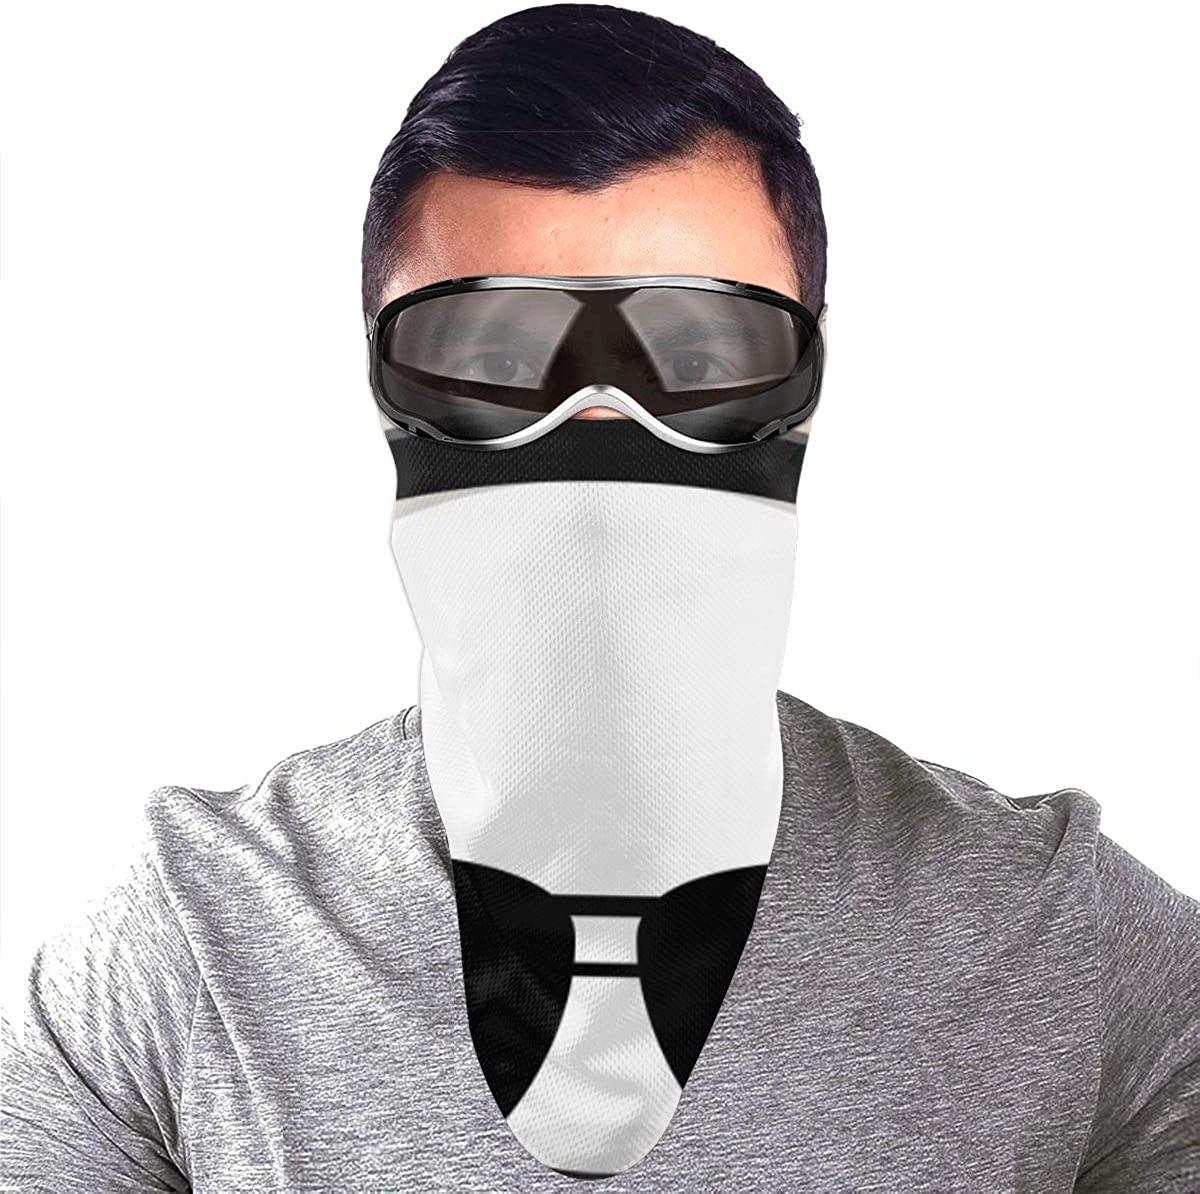 Bandana Scarf,ski mask Head Scarf for Women,face mask for dust Sun Protection